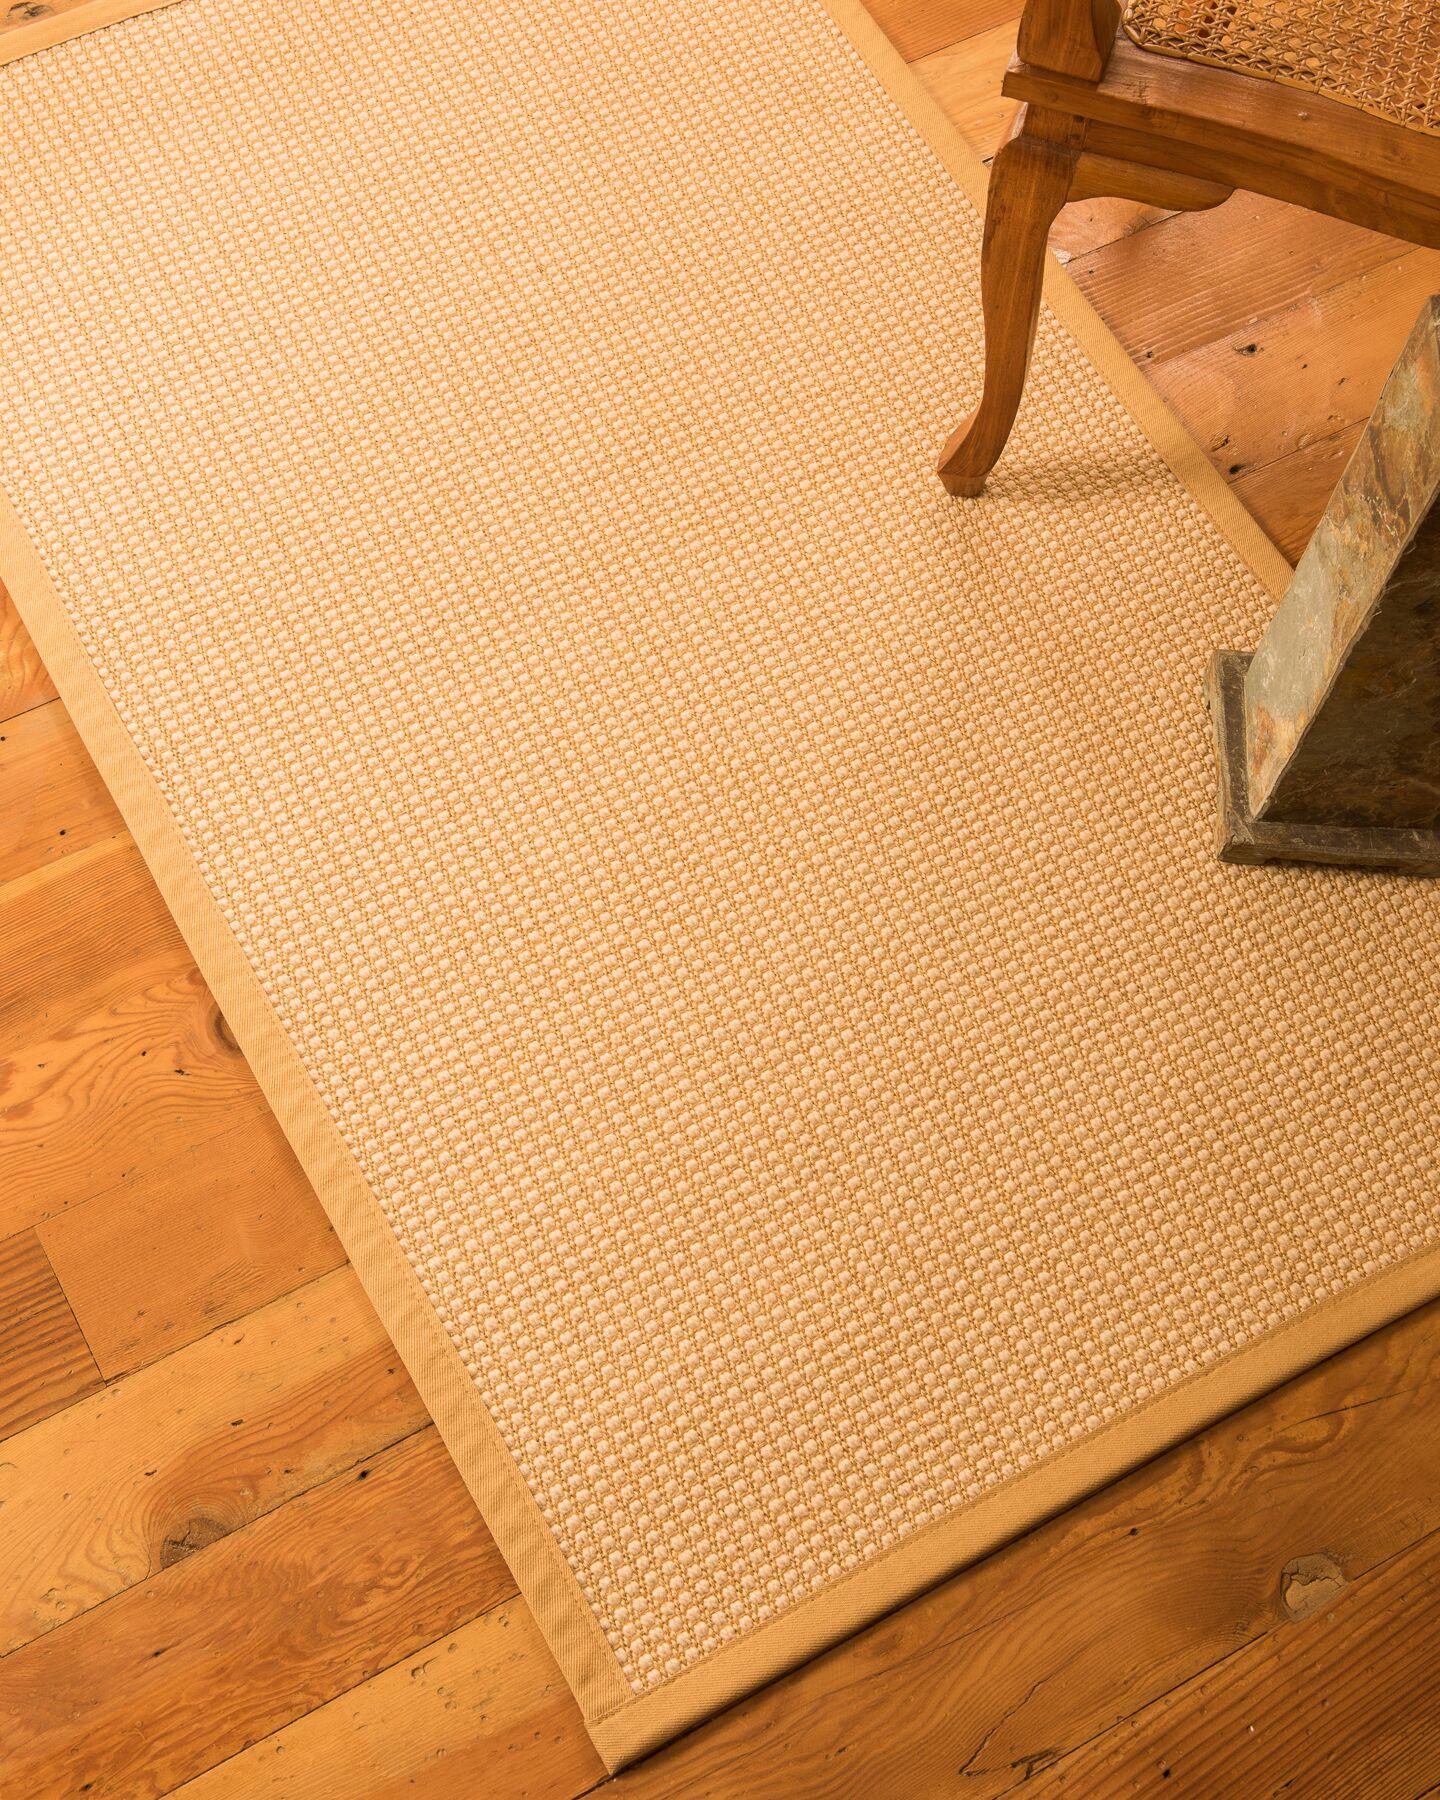 Brashears Hand-Woven Tan Area Rug Rug Size: Rectangle 6' x 9'